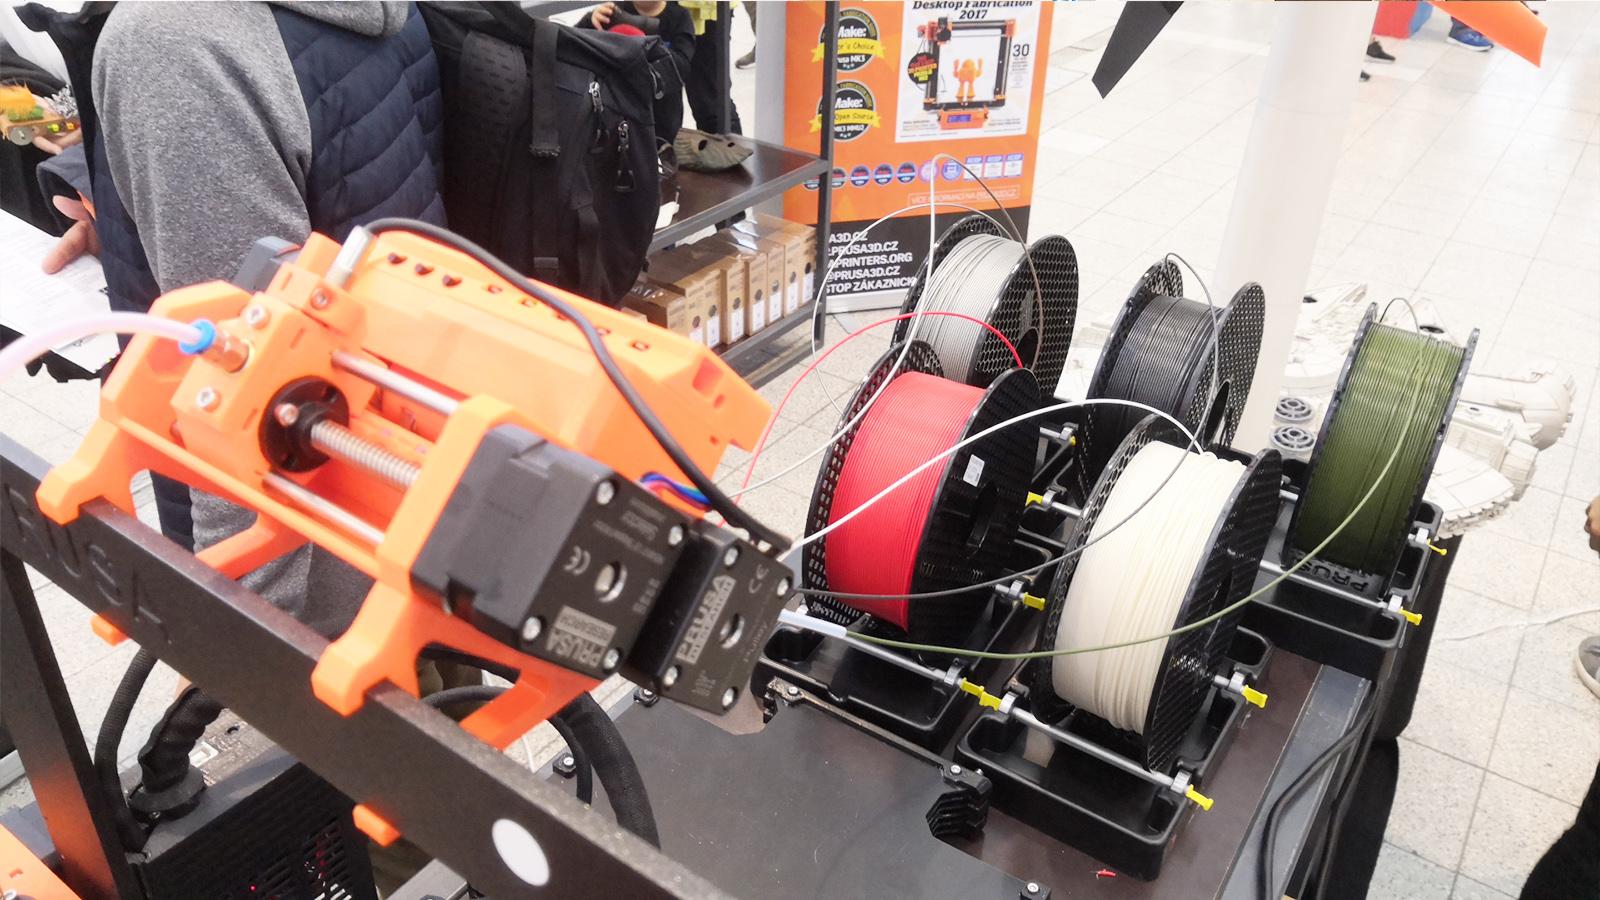 Multimaterial MMU2 Original Prusa Mini Maker Faire Brno